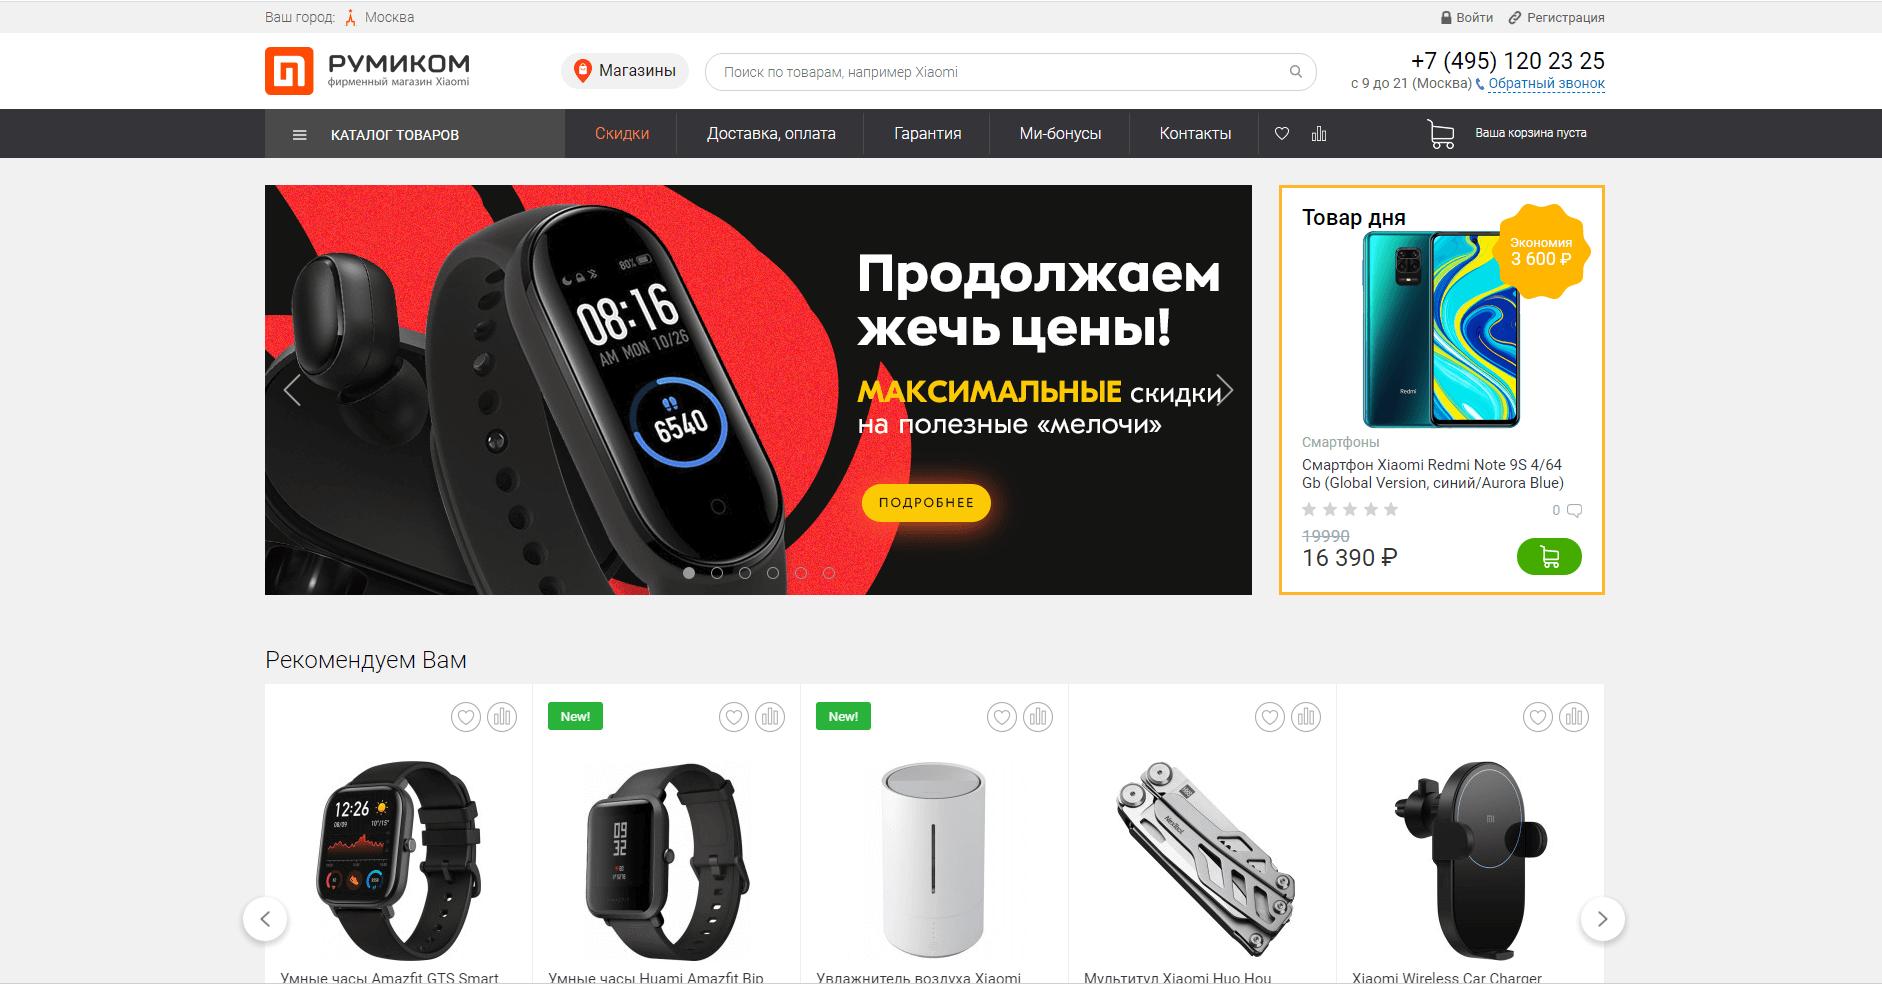 ru-mi.com website